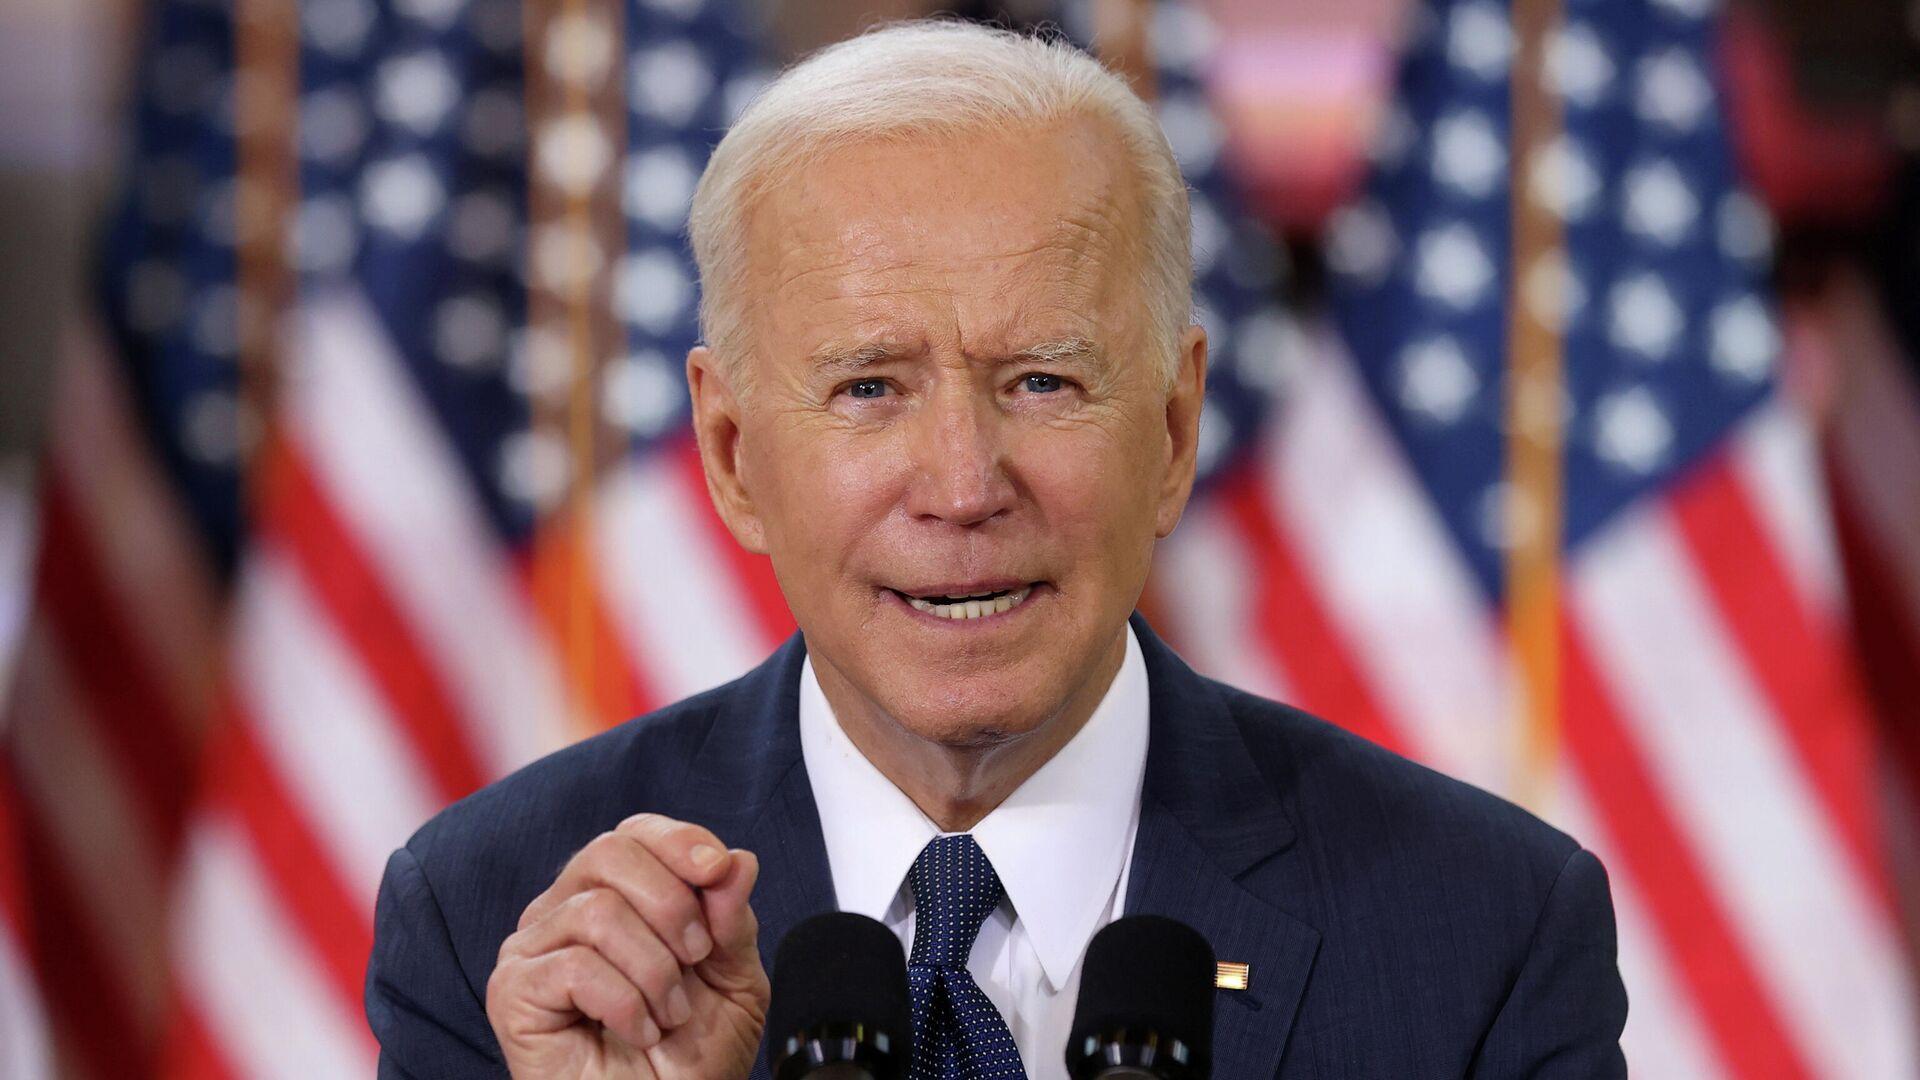 Joe Biden, presidente de EEUU - Sputnik Mundo, 1920, 24.04.2021